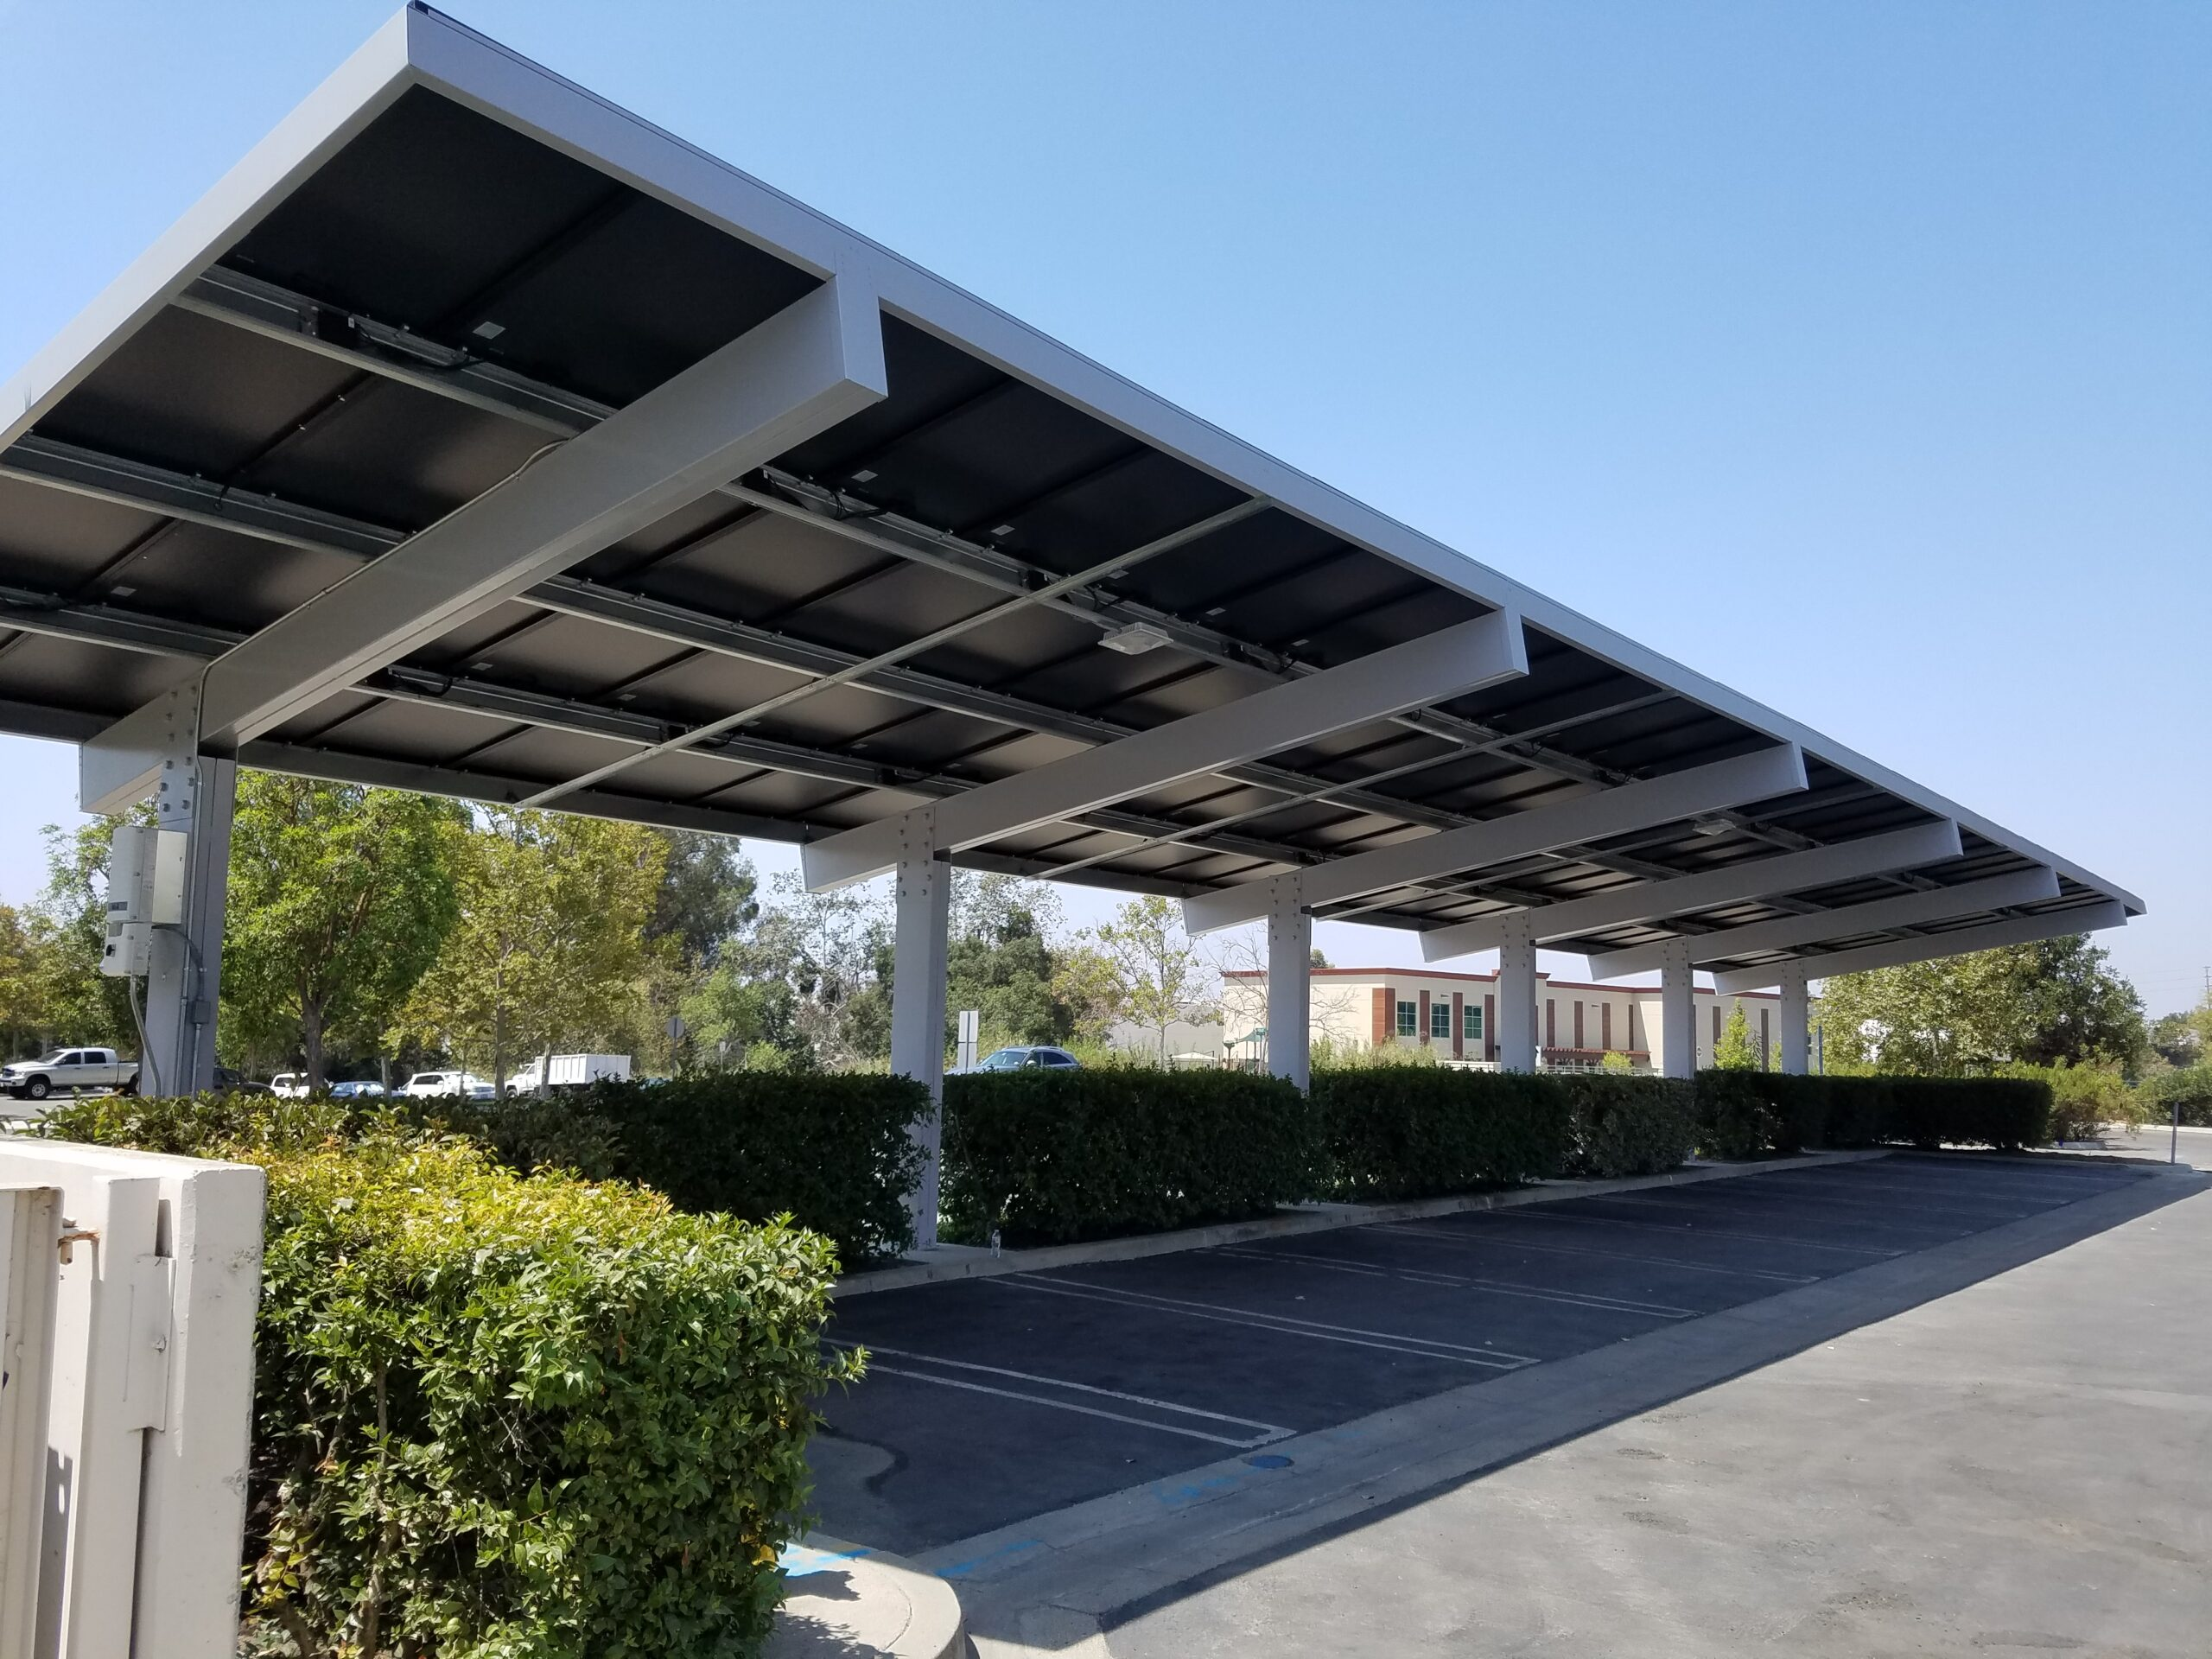 Solar Carport Canopy